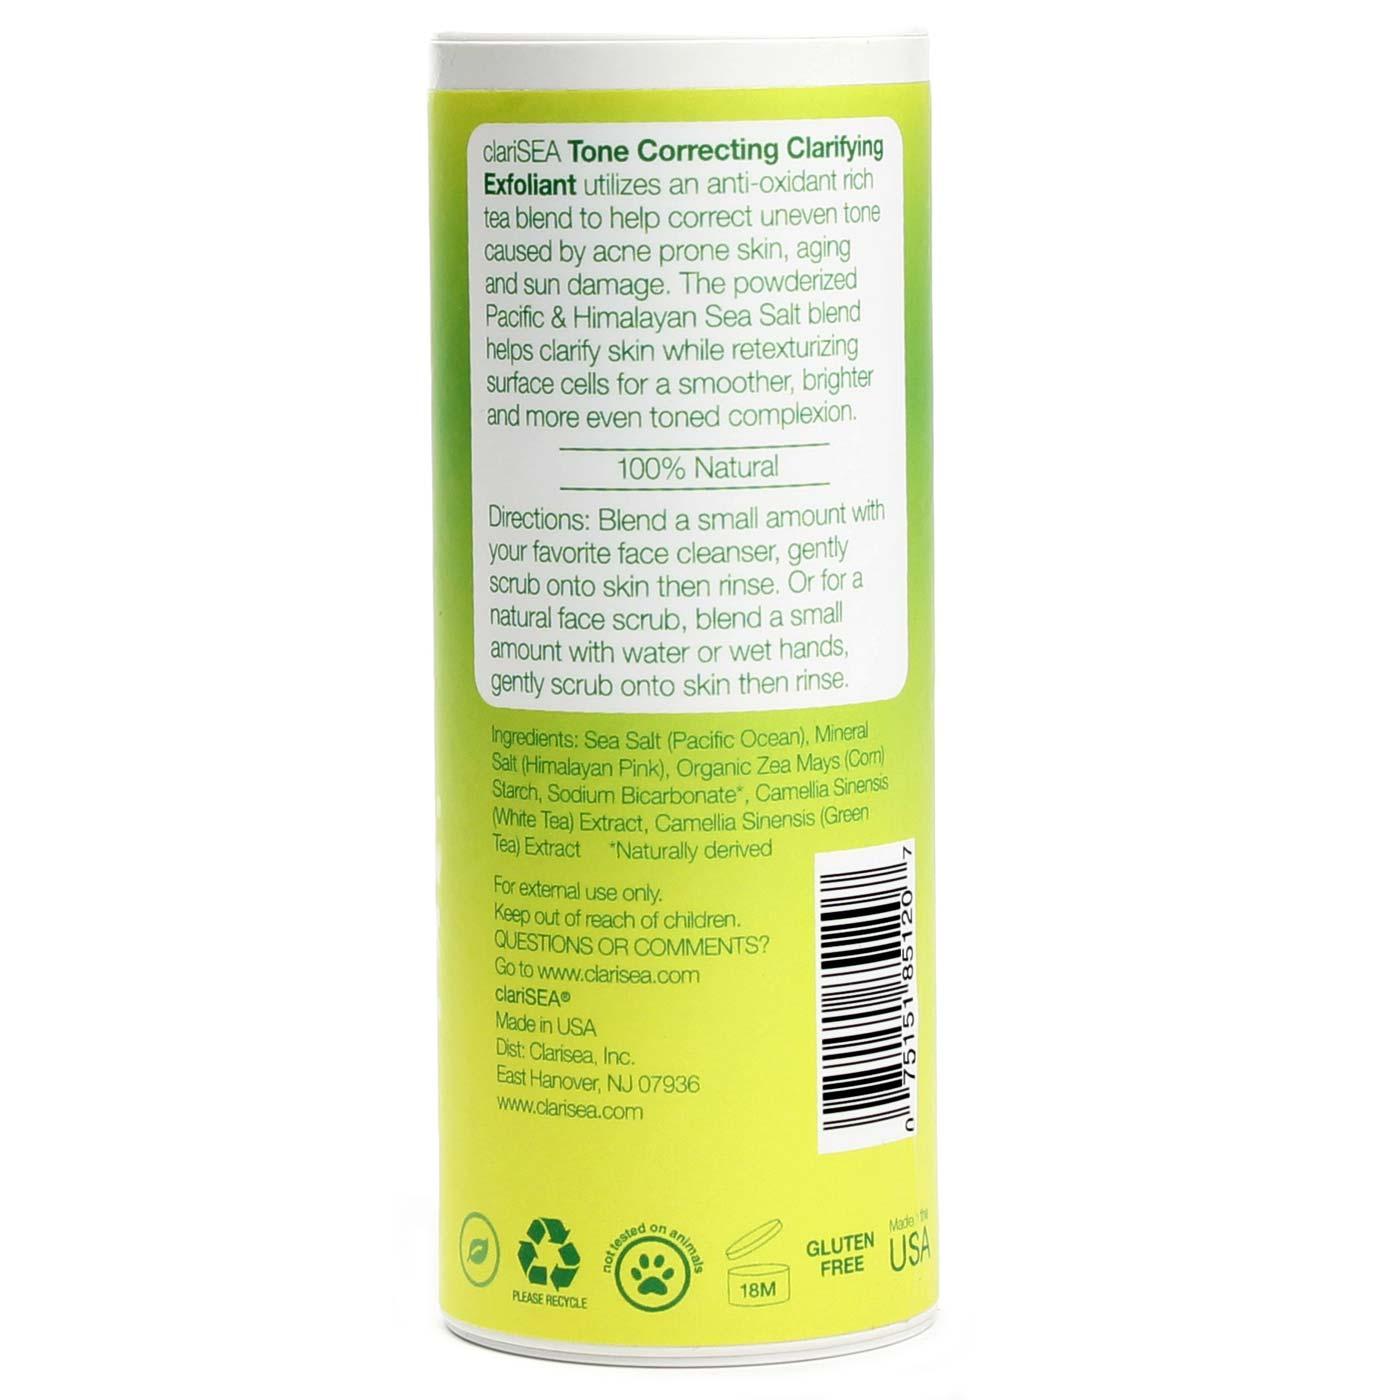 clariSEA Sea Salt Solutions Tone Correcting Clarifying Exfoliant, FACE, 5 oz. Jurlique Soothing Day Care Lotion, 3.3 Fluid Ounce